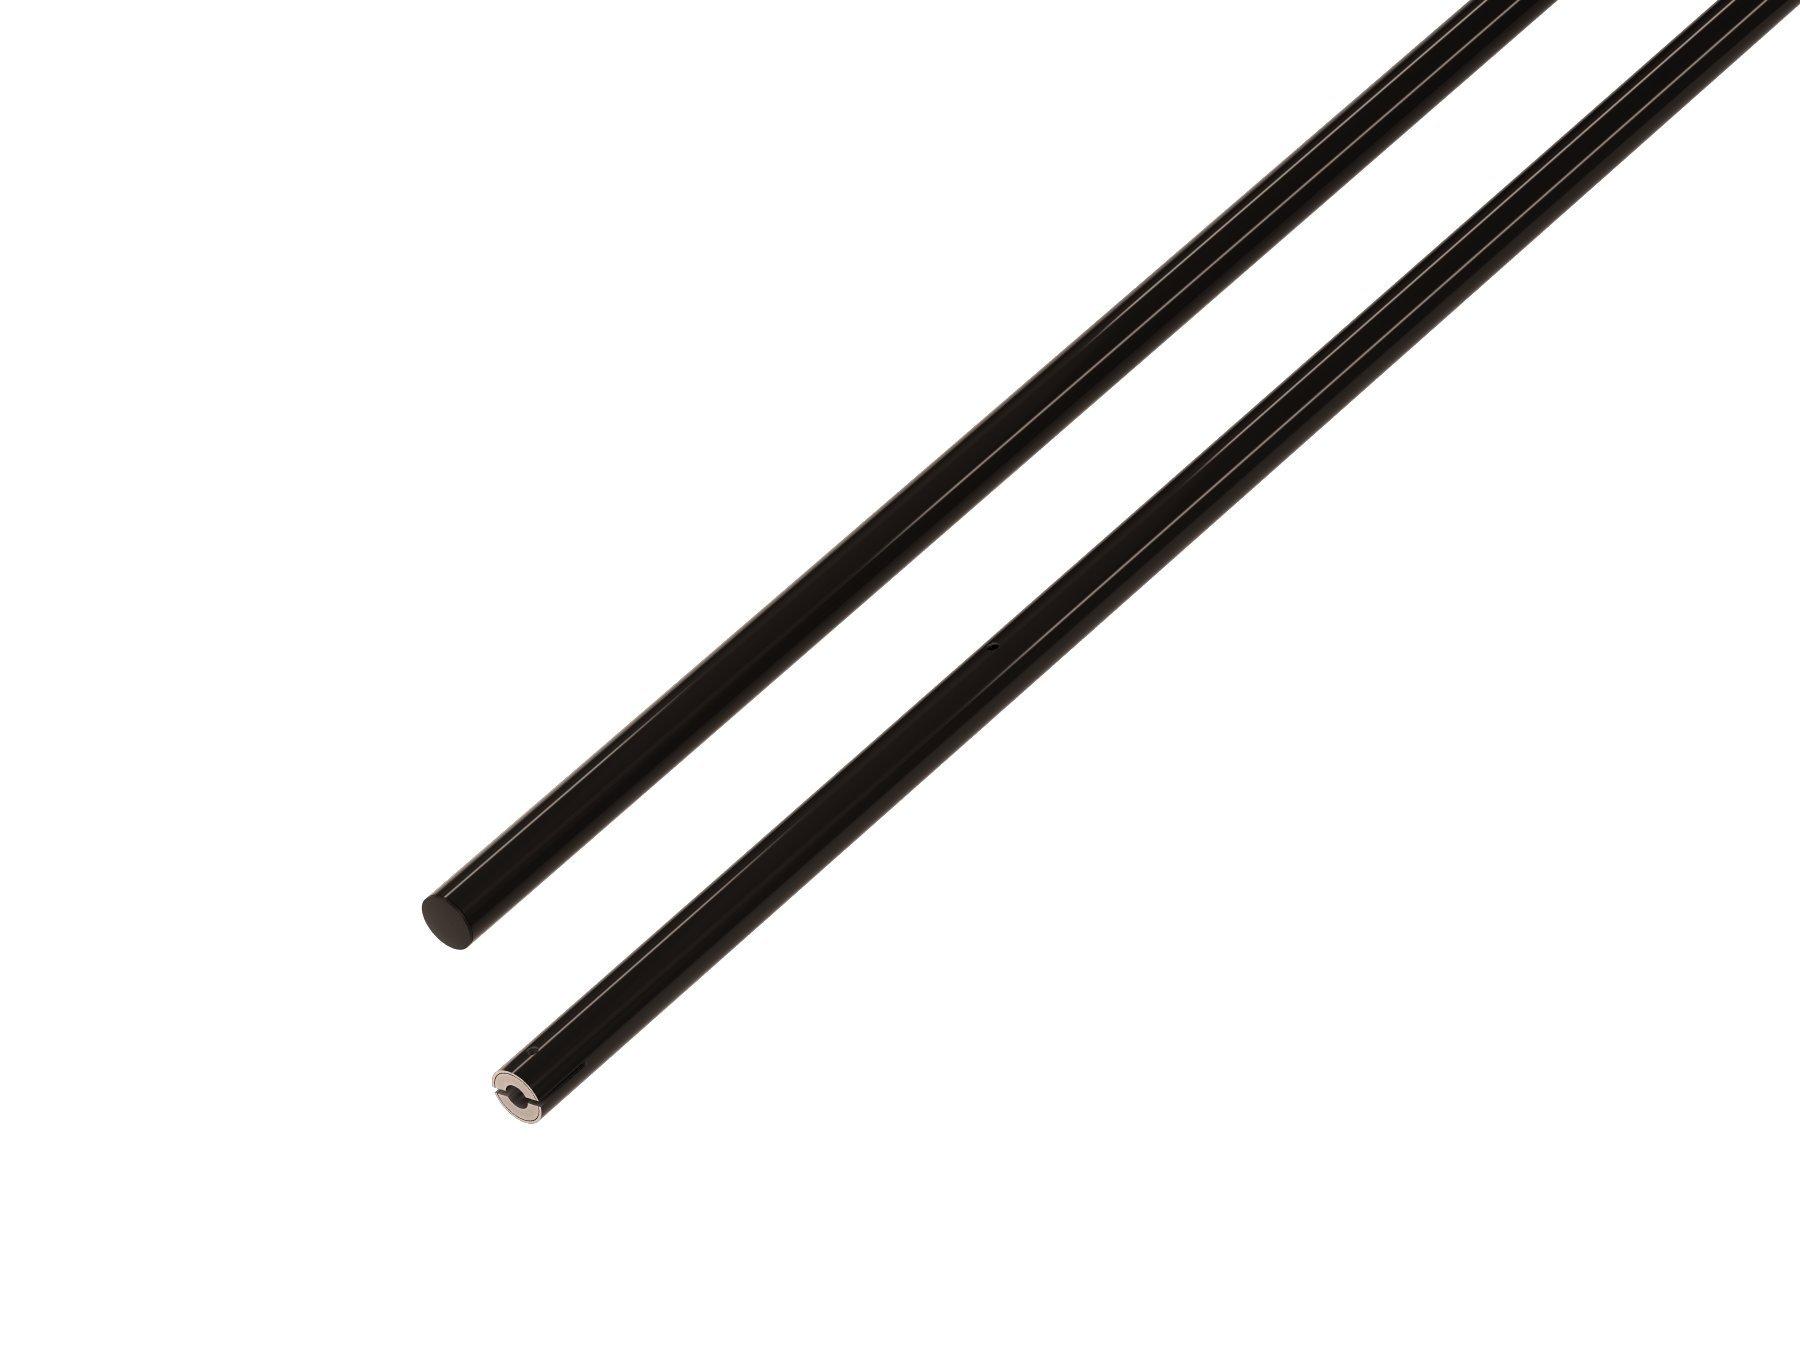 Bon 22-472 72'' Aluminum Handle for Rakes by bon